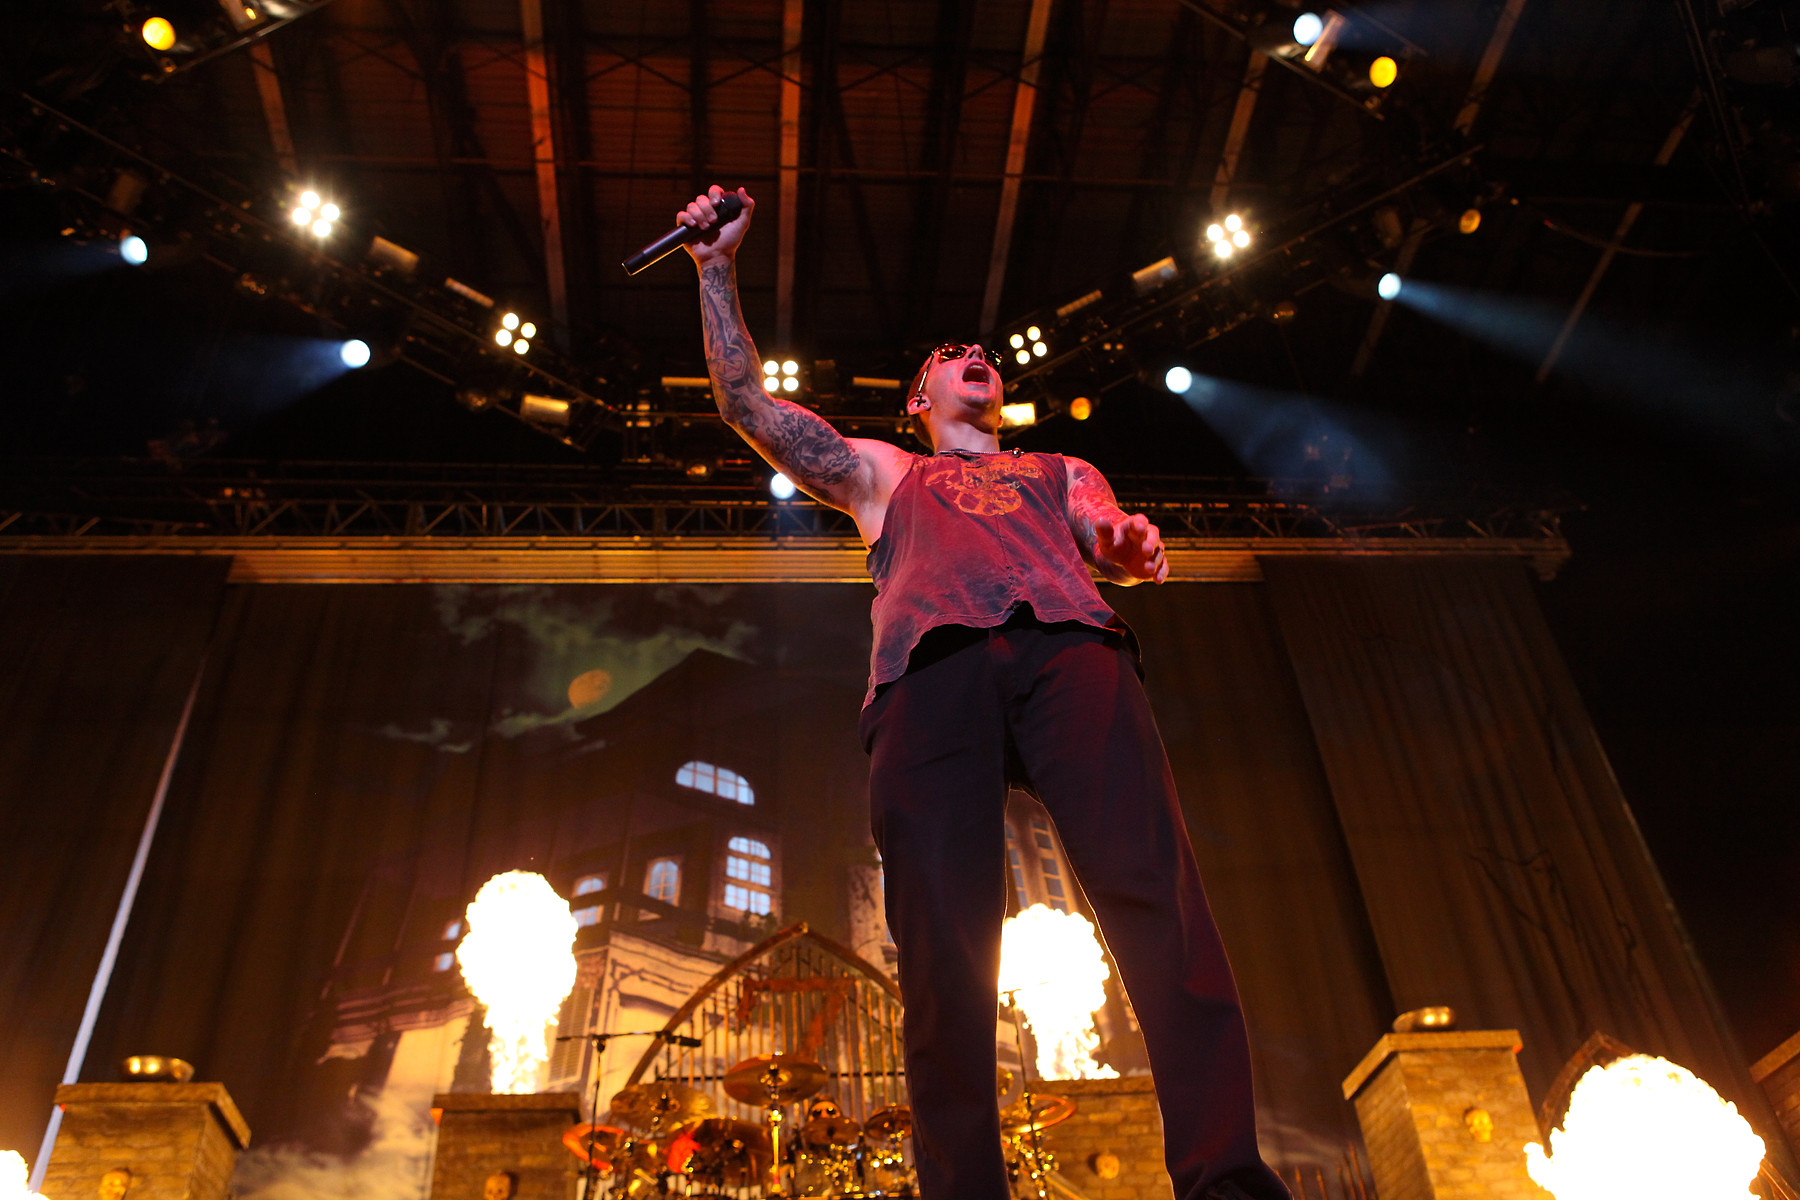 Avenged Sevenfold @ Uproar 2010